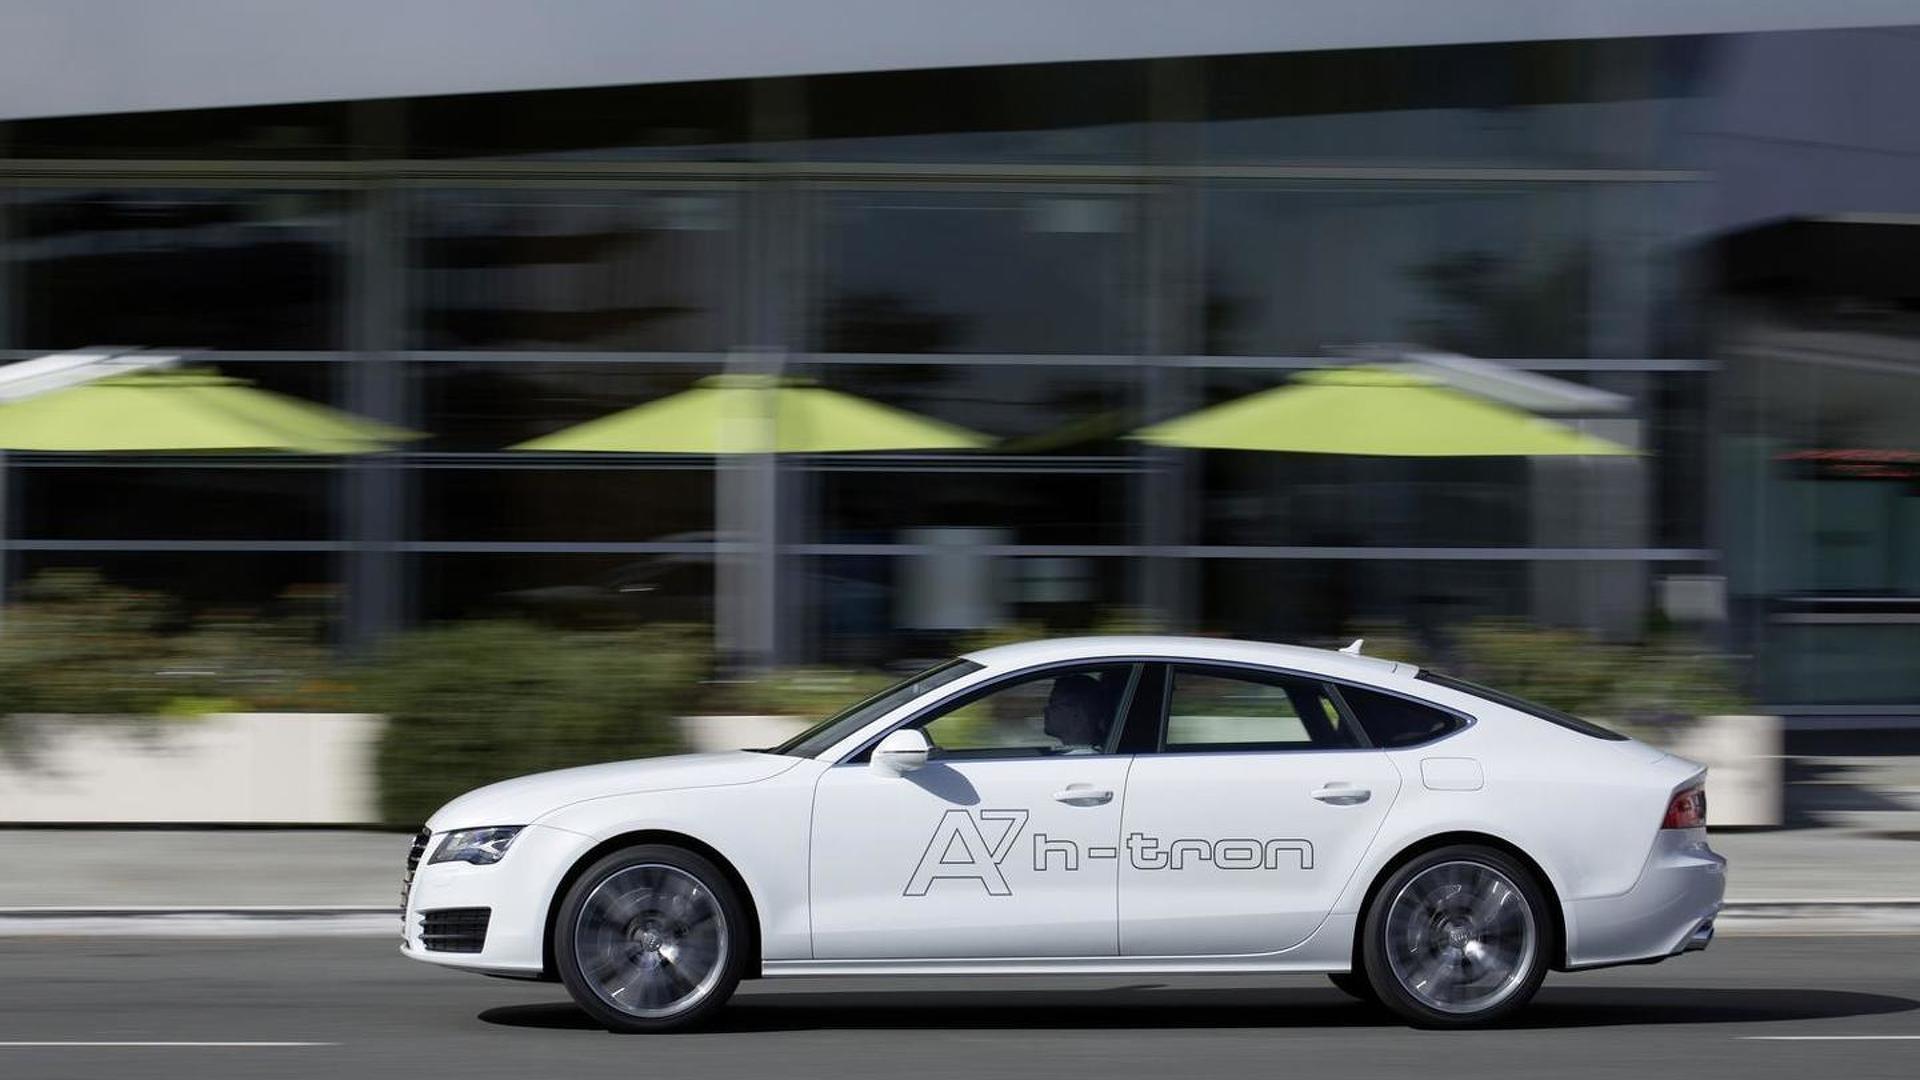 Audi A7 Sportback h-tron quattro 2014 года